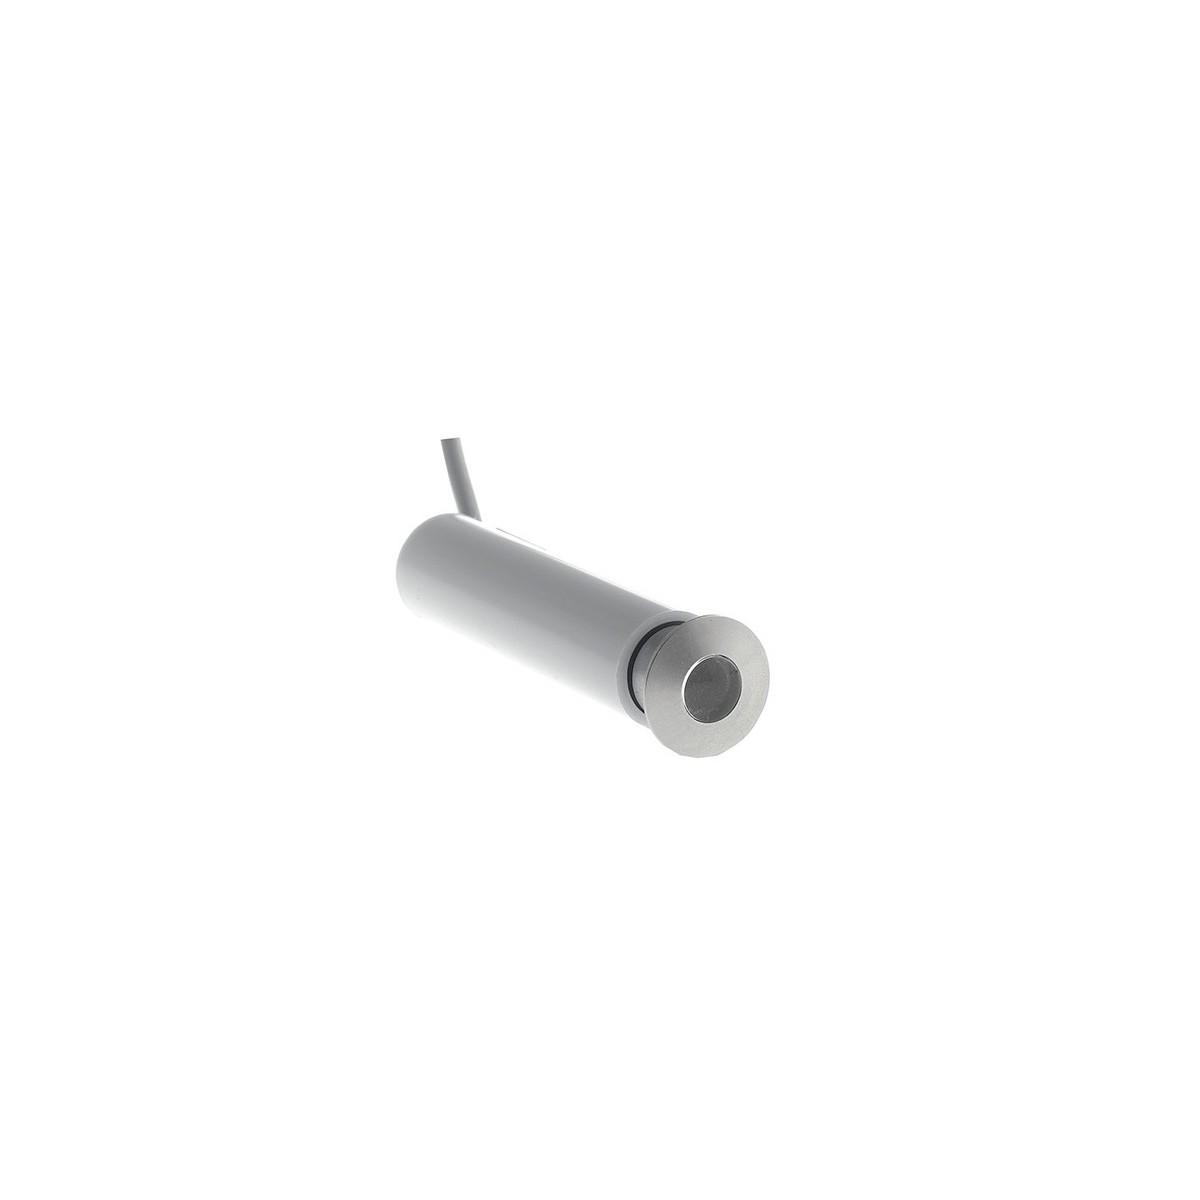 LED-BARRET-R24 Calpestabile Nickel Led